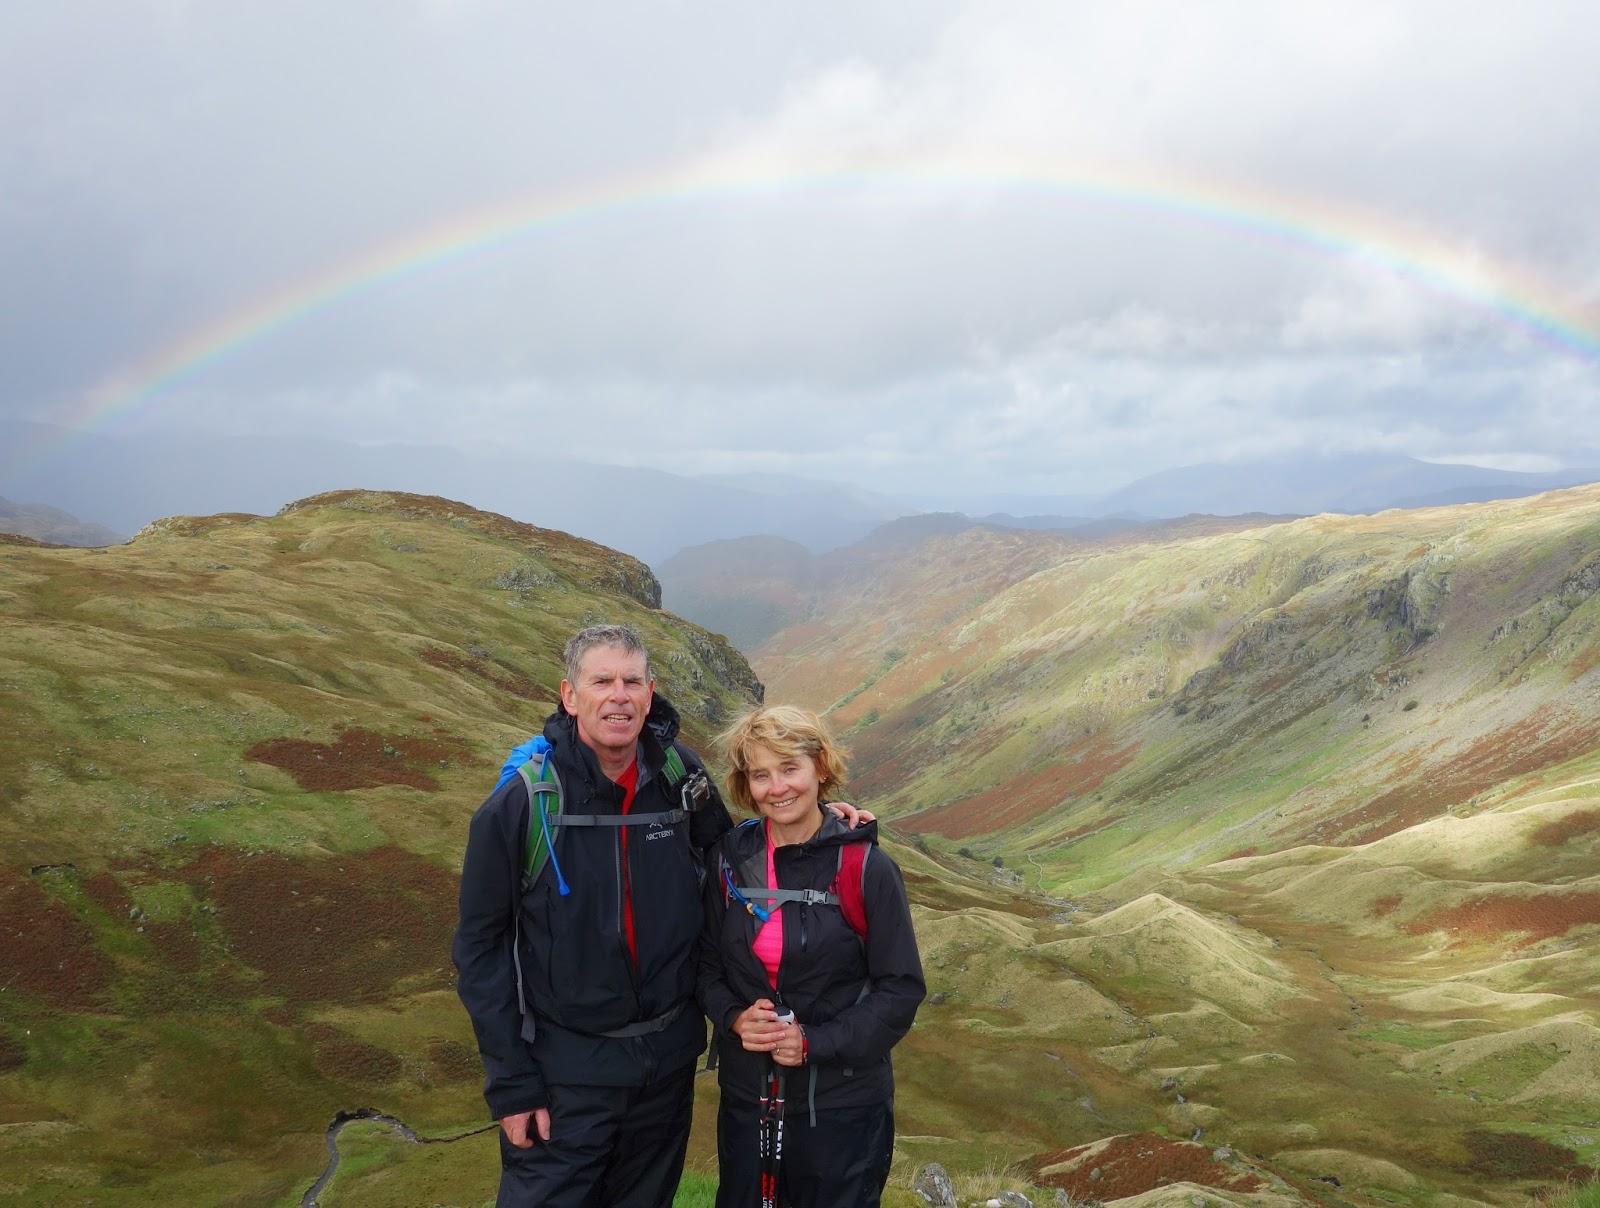 Gail and John Hanlon below a rainbow hiking in the Borrowdale Valley